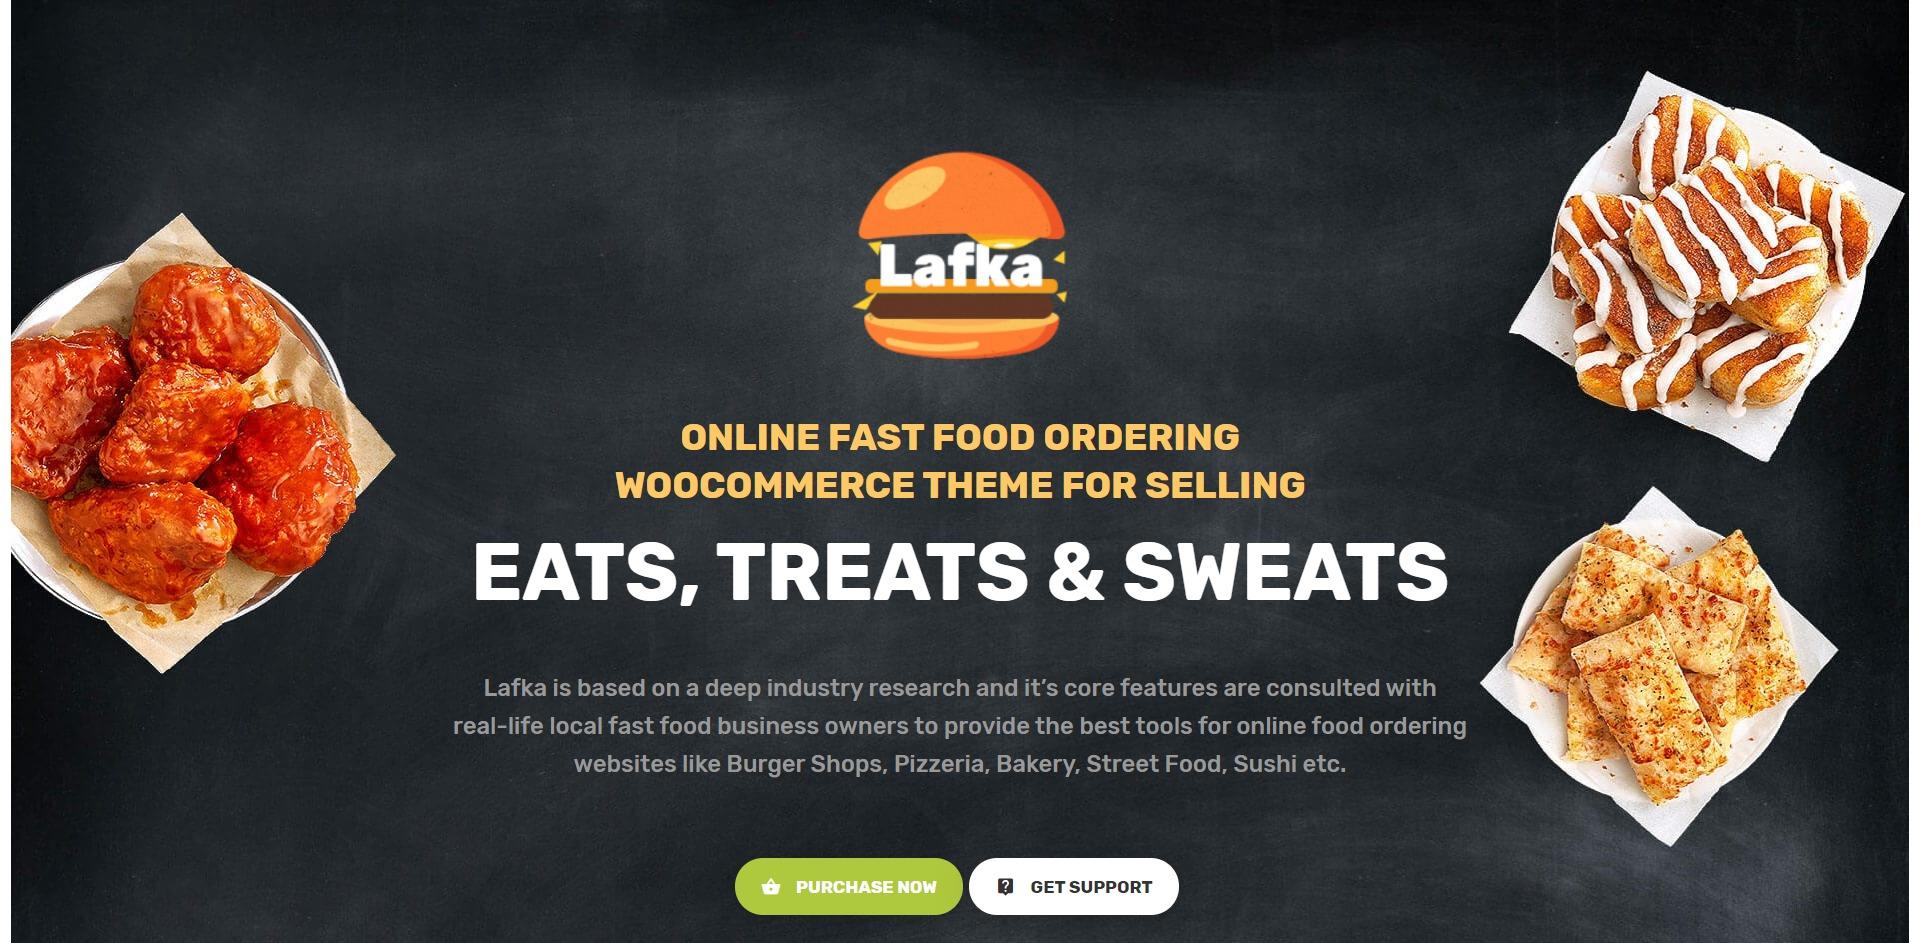 Lafka-汉堡披萨快餐外卖WordPress主题